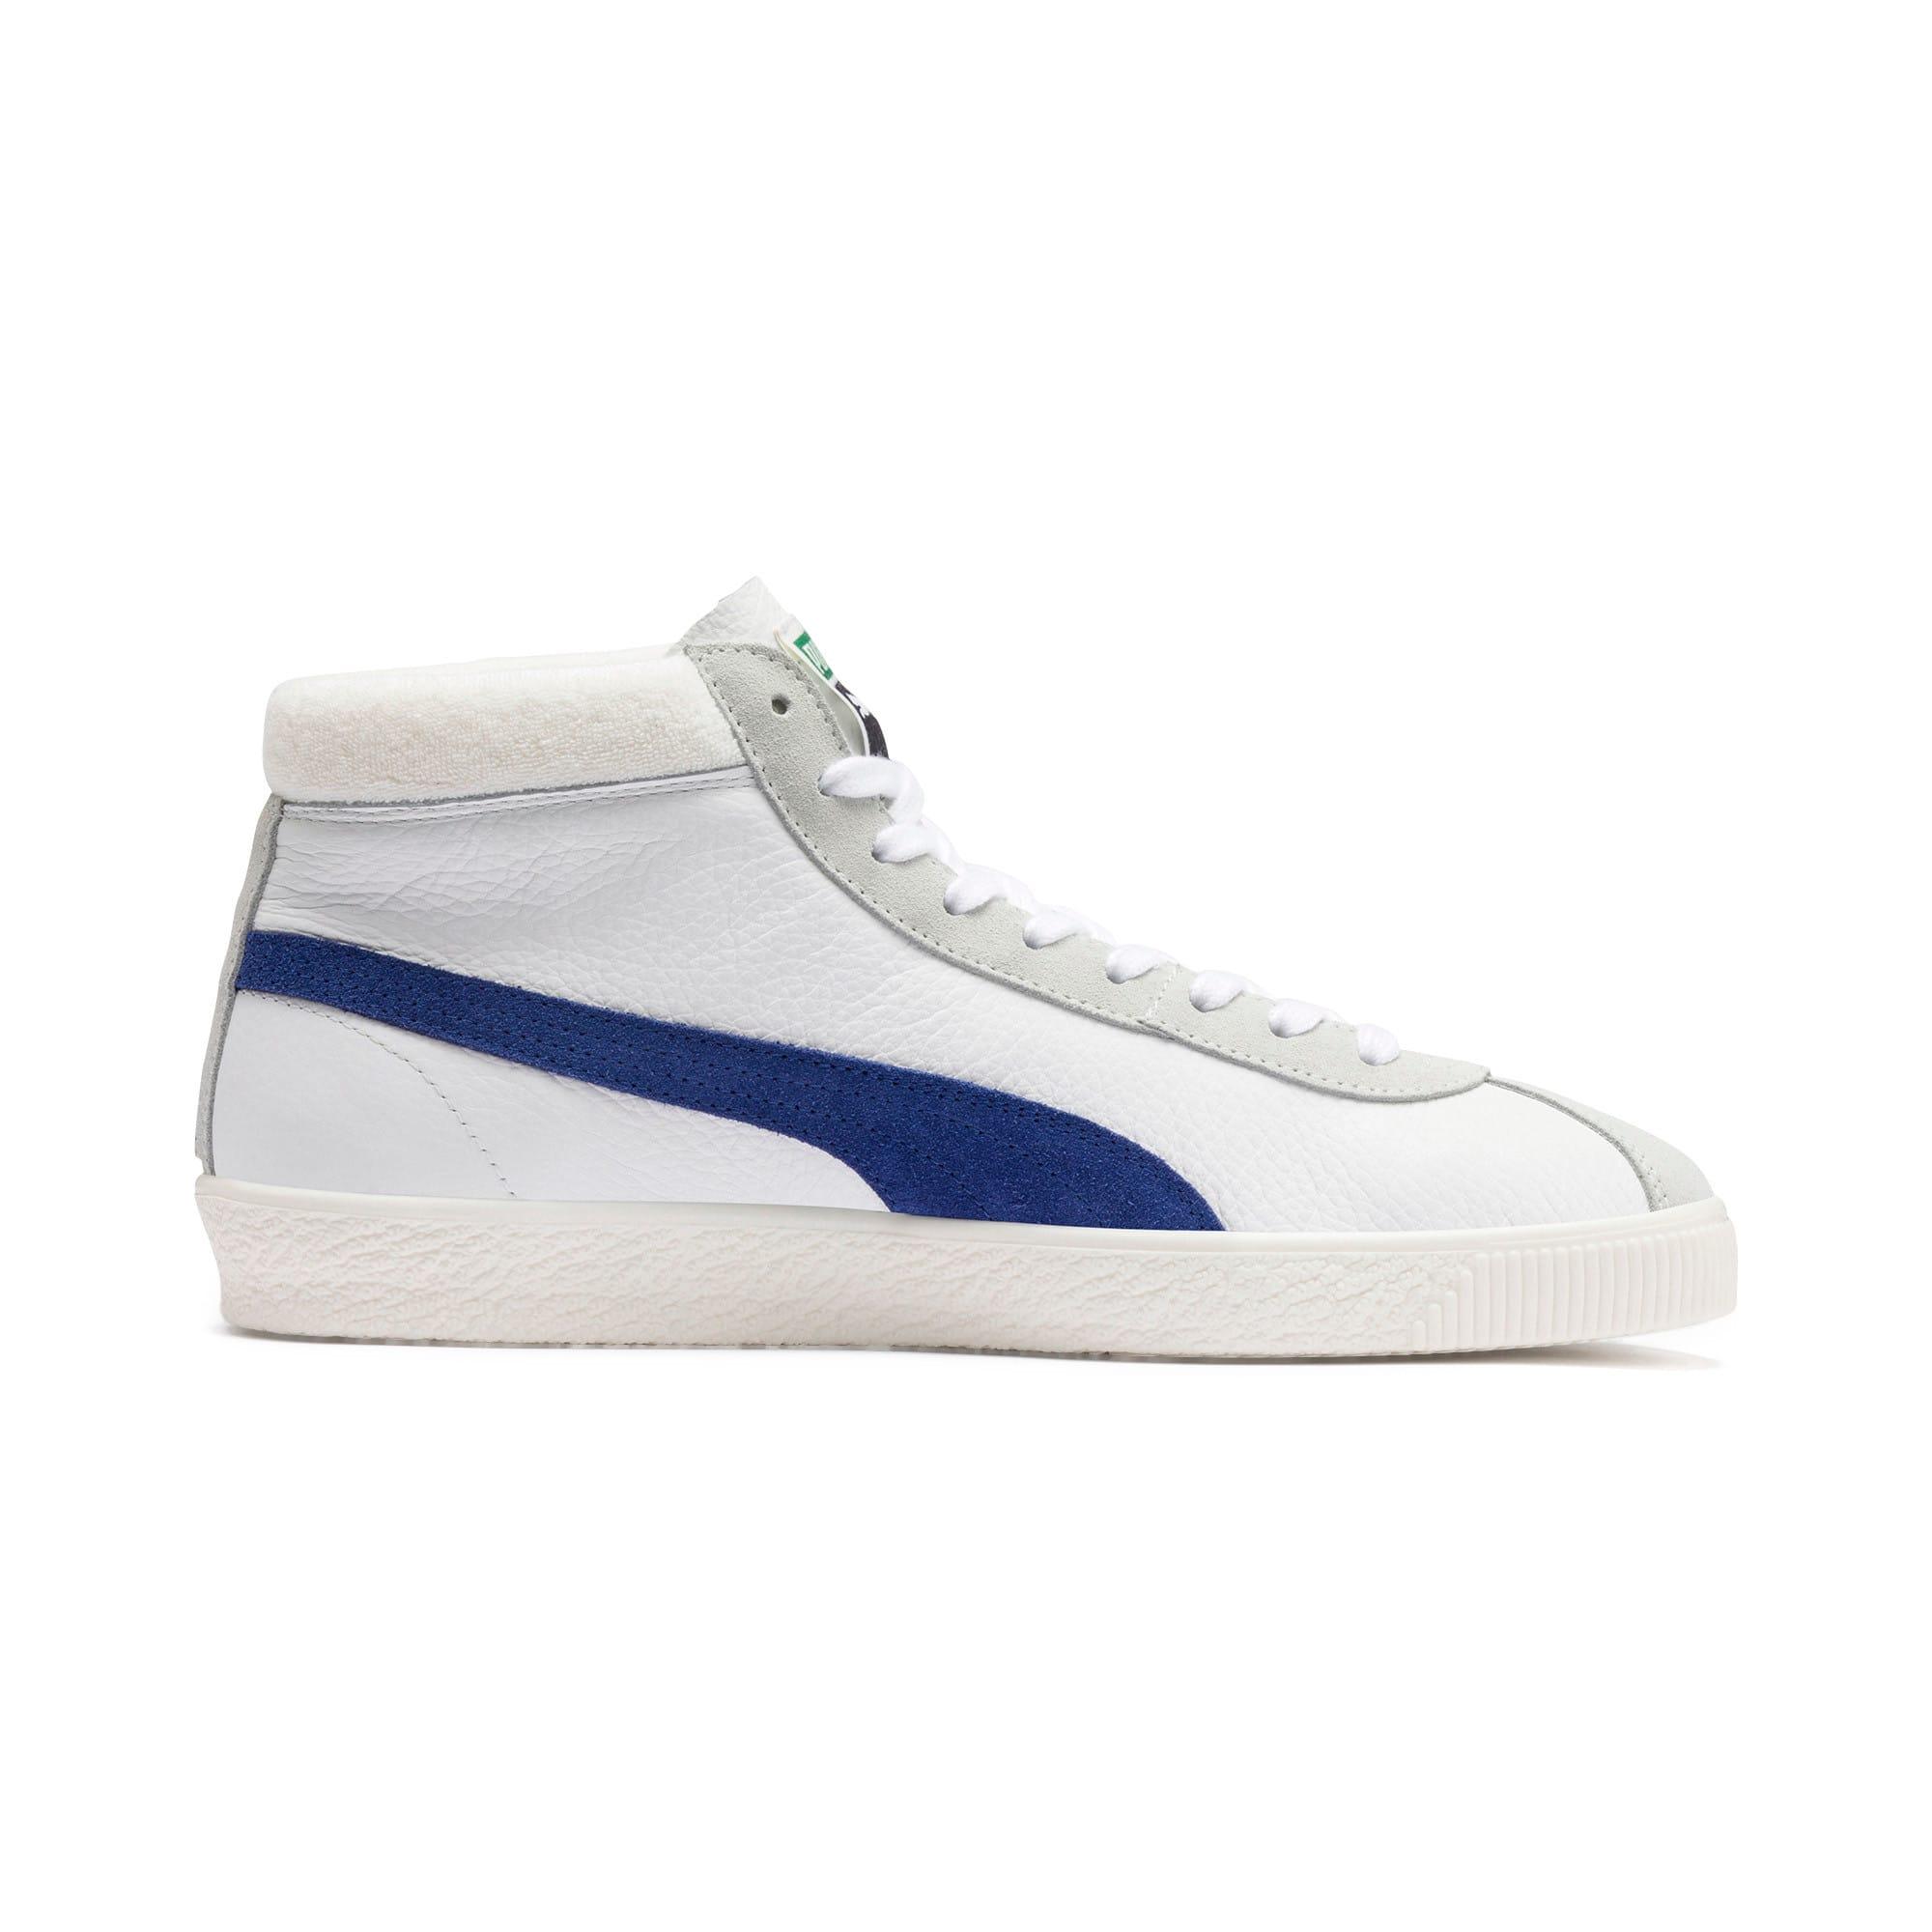 Thumbnail 6 of Halfhoge Basket '68 sportschoenen, Puma White-Galaxy Blue, medium